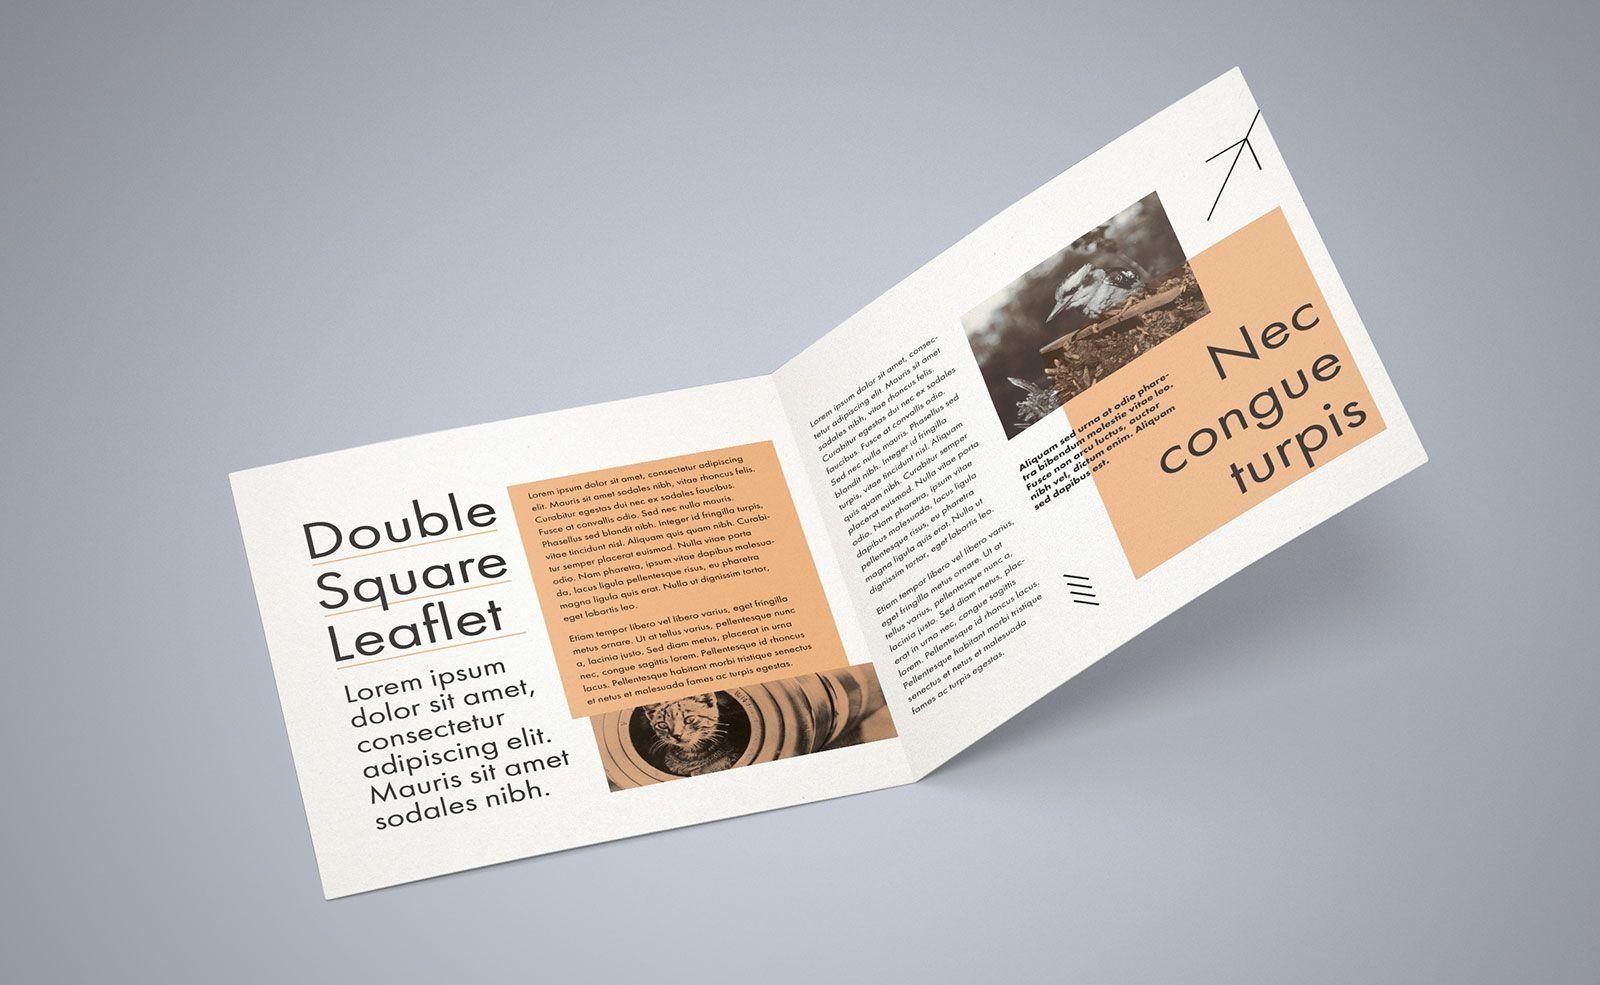 000 Impressive Square Brochure Template Psd Free Download Image Full